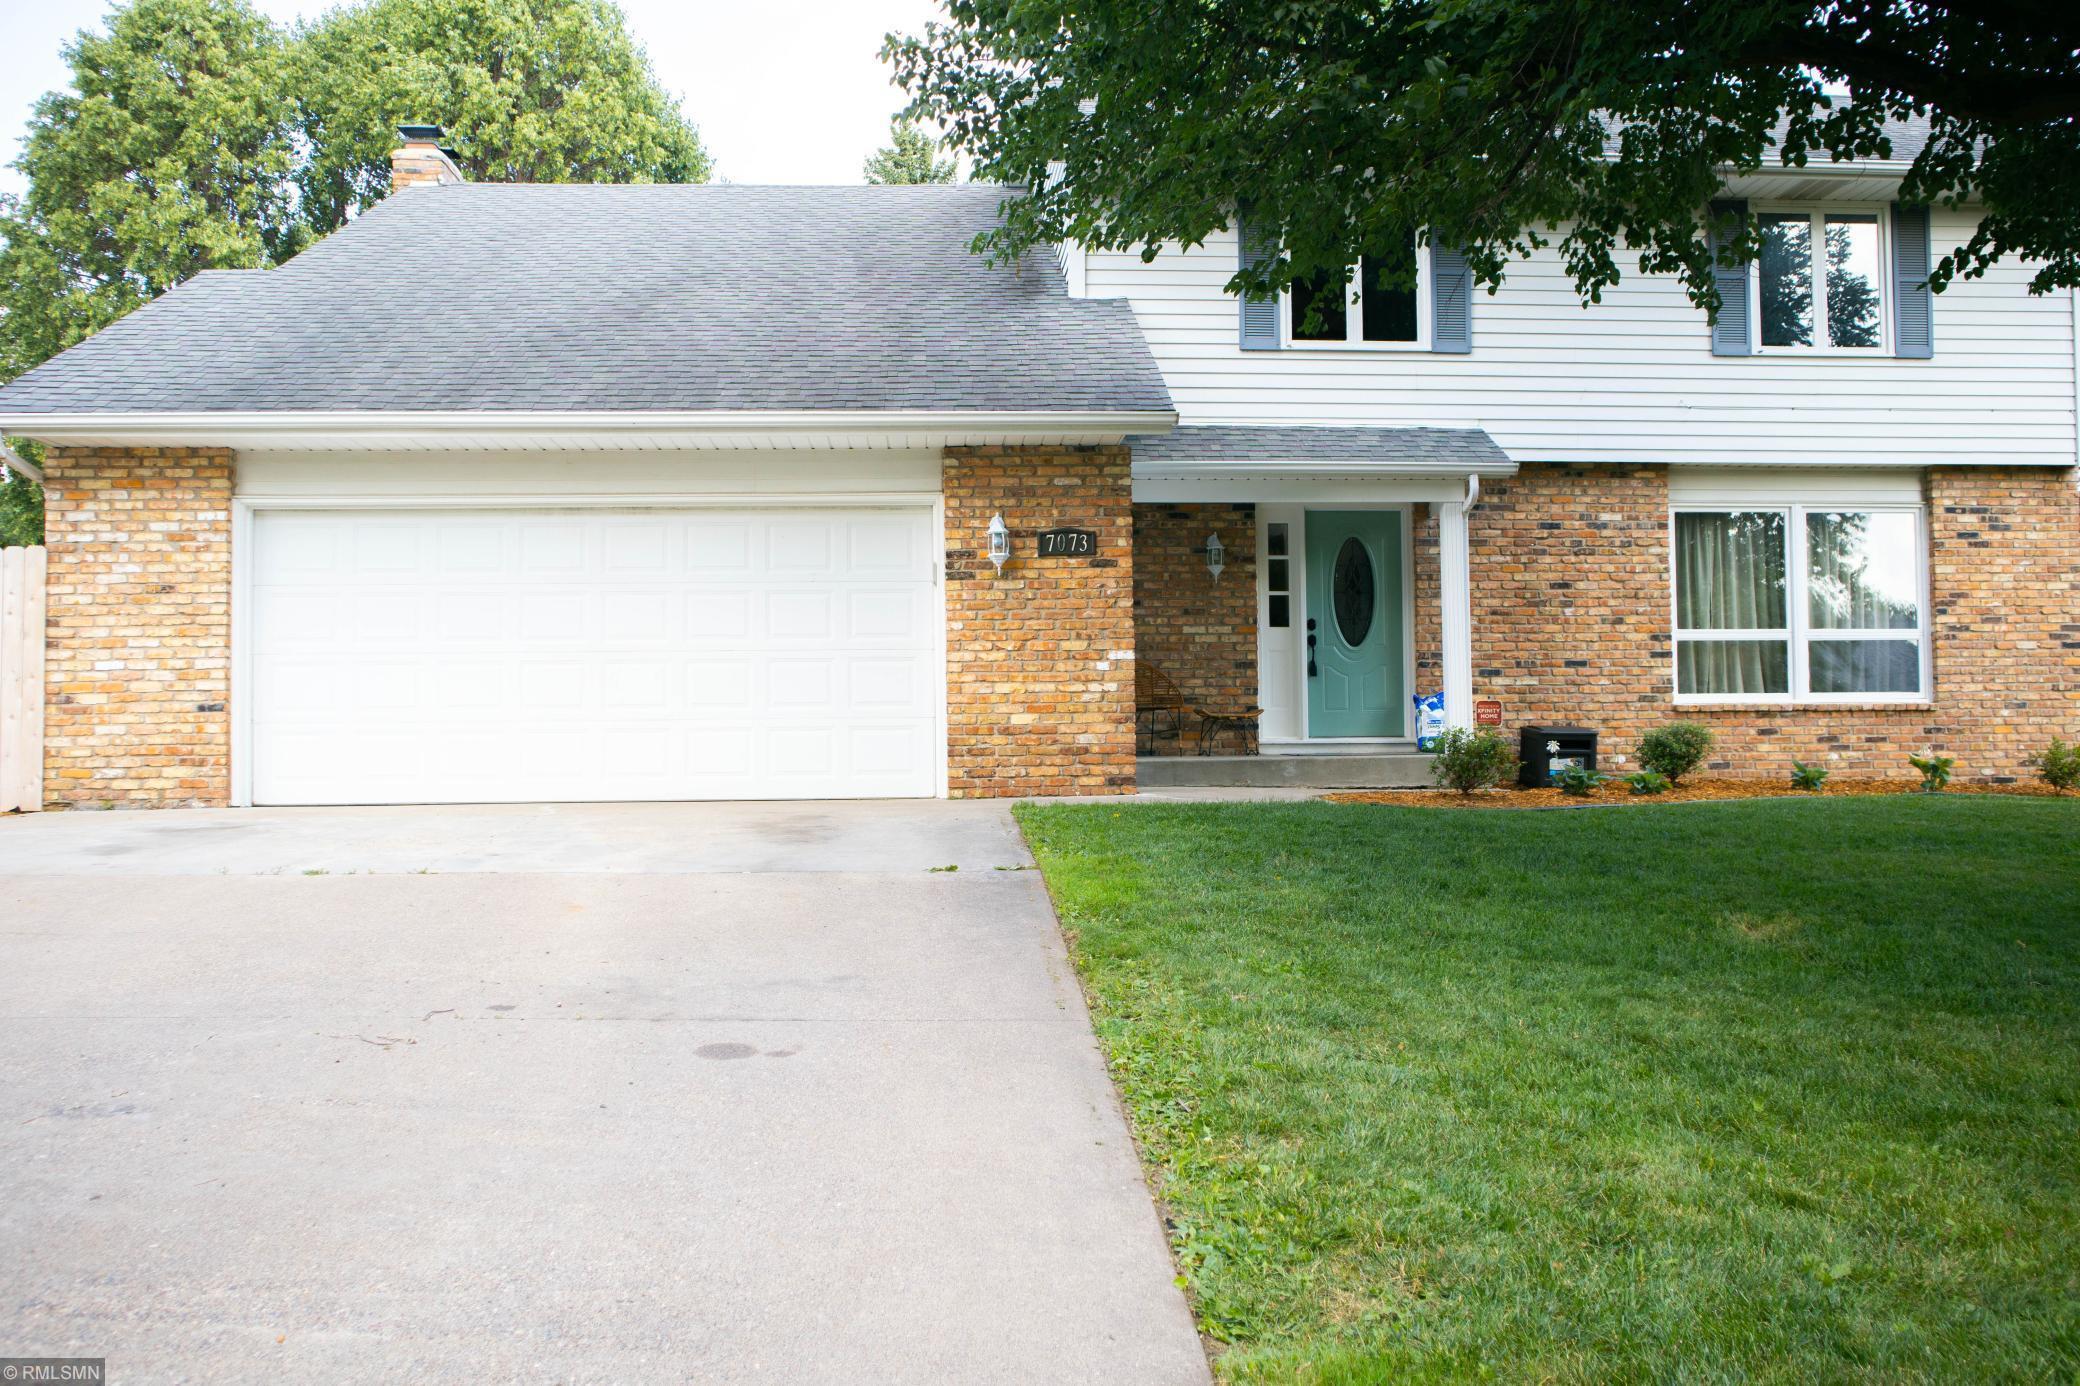 7073 Irvin Avenue S, Cottage Grove, MN 55016